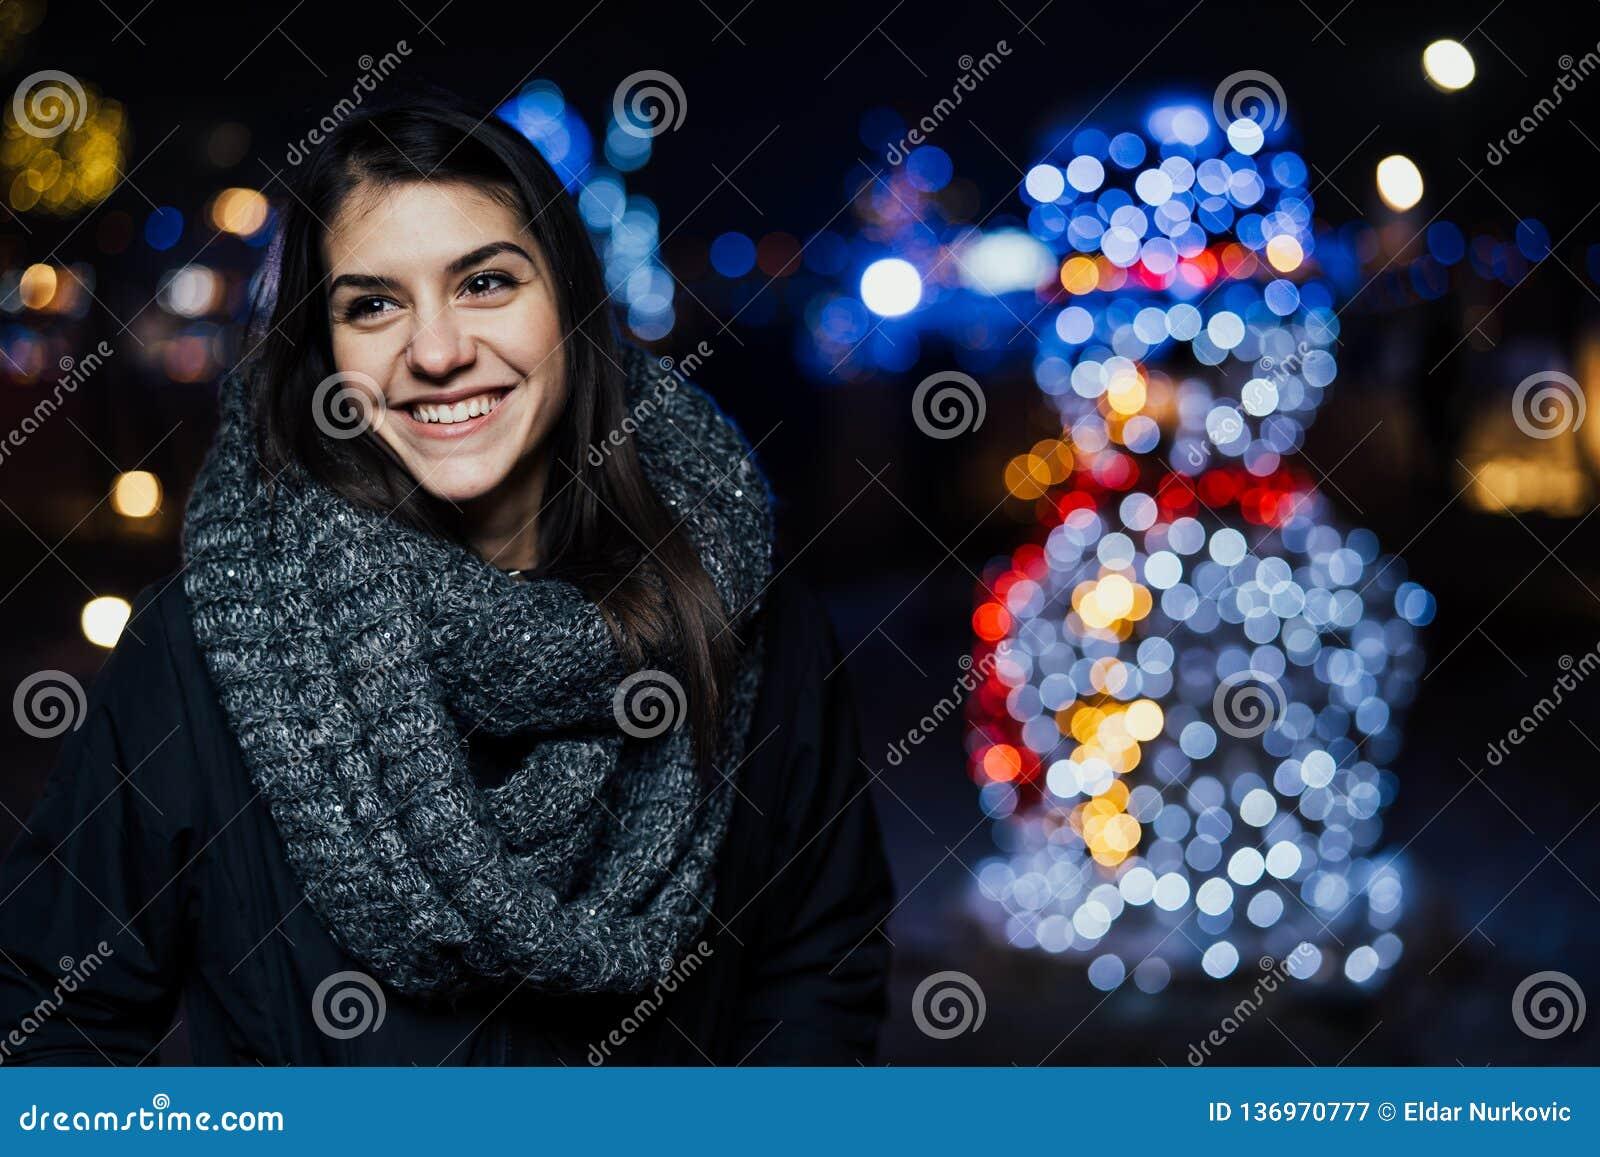 Night portrait of a beautiful brunette woman smiling enjoying winter in park.Winter joy.Winter holidays.Positive emotions.